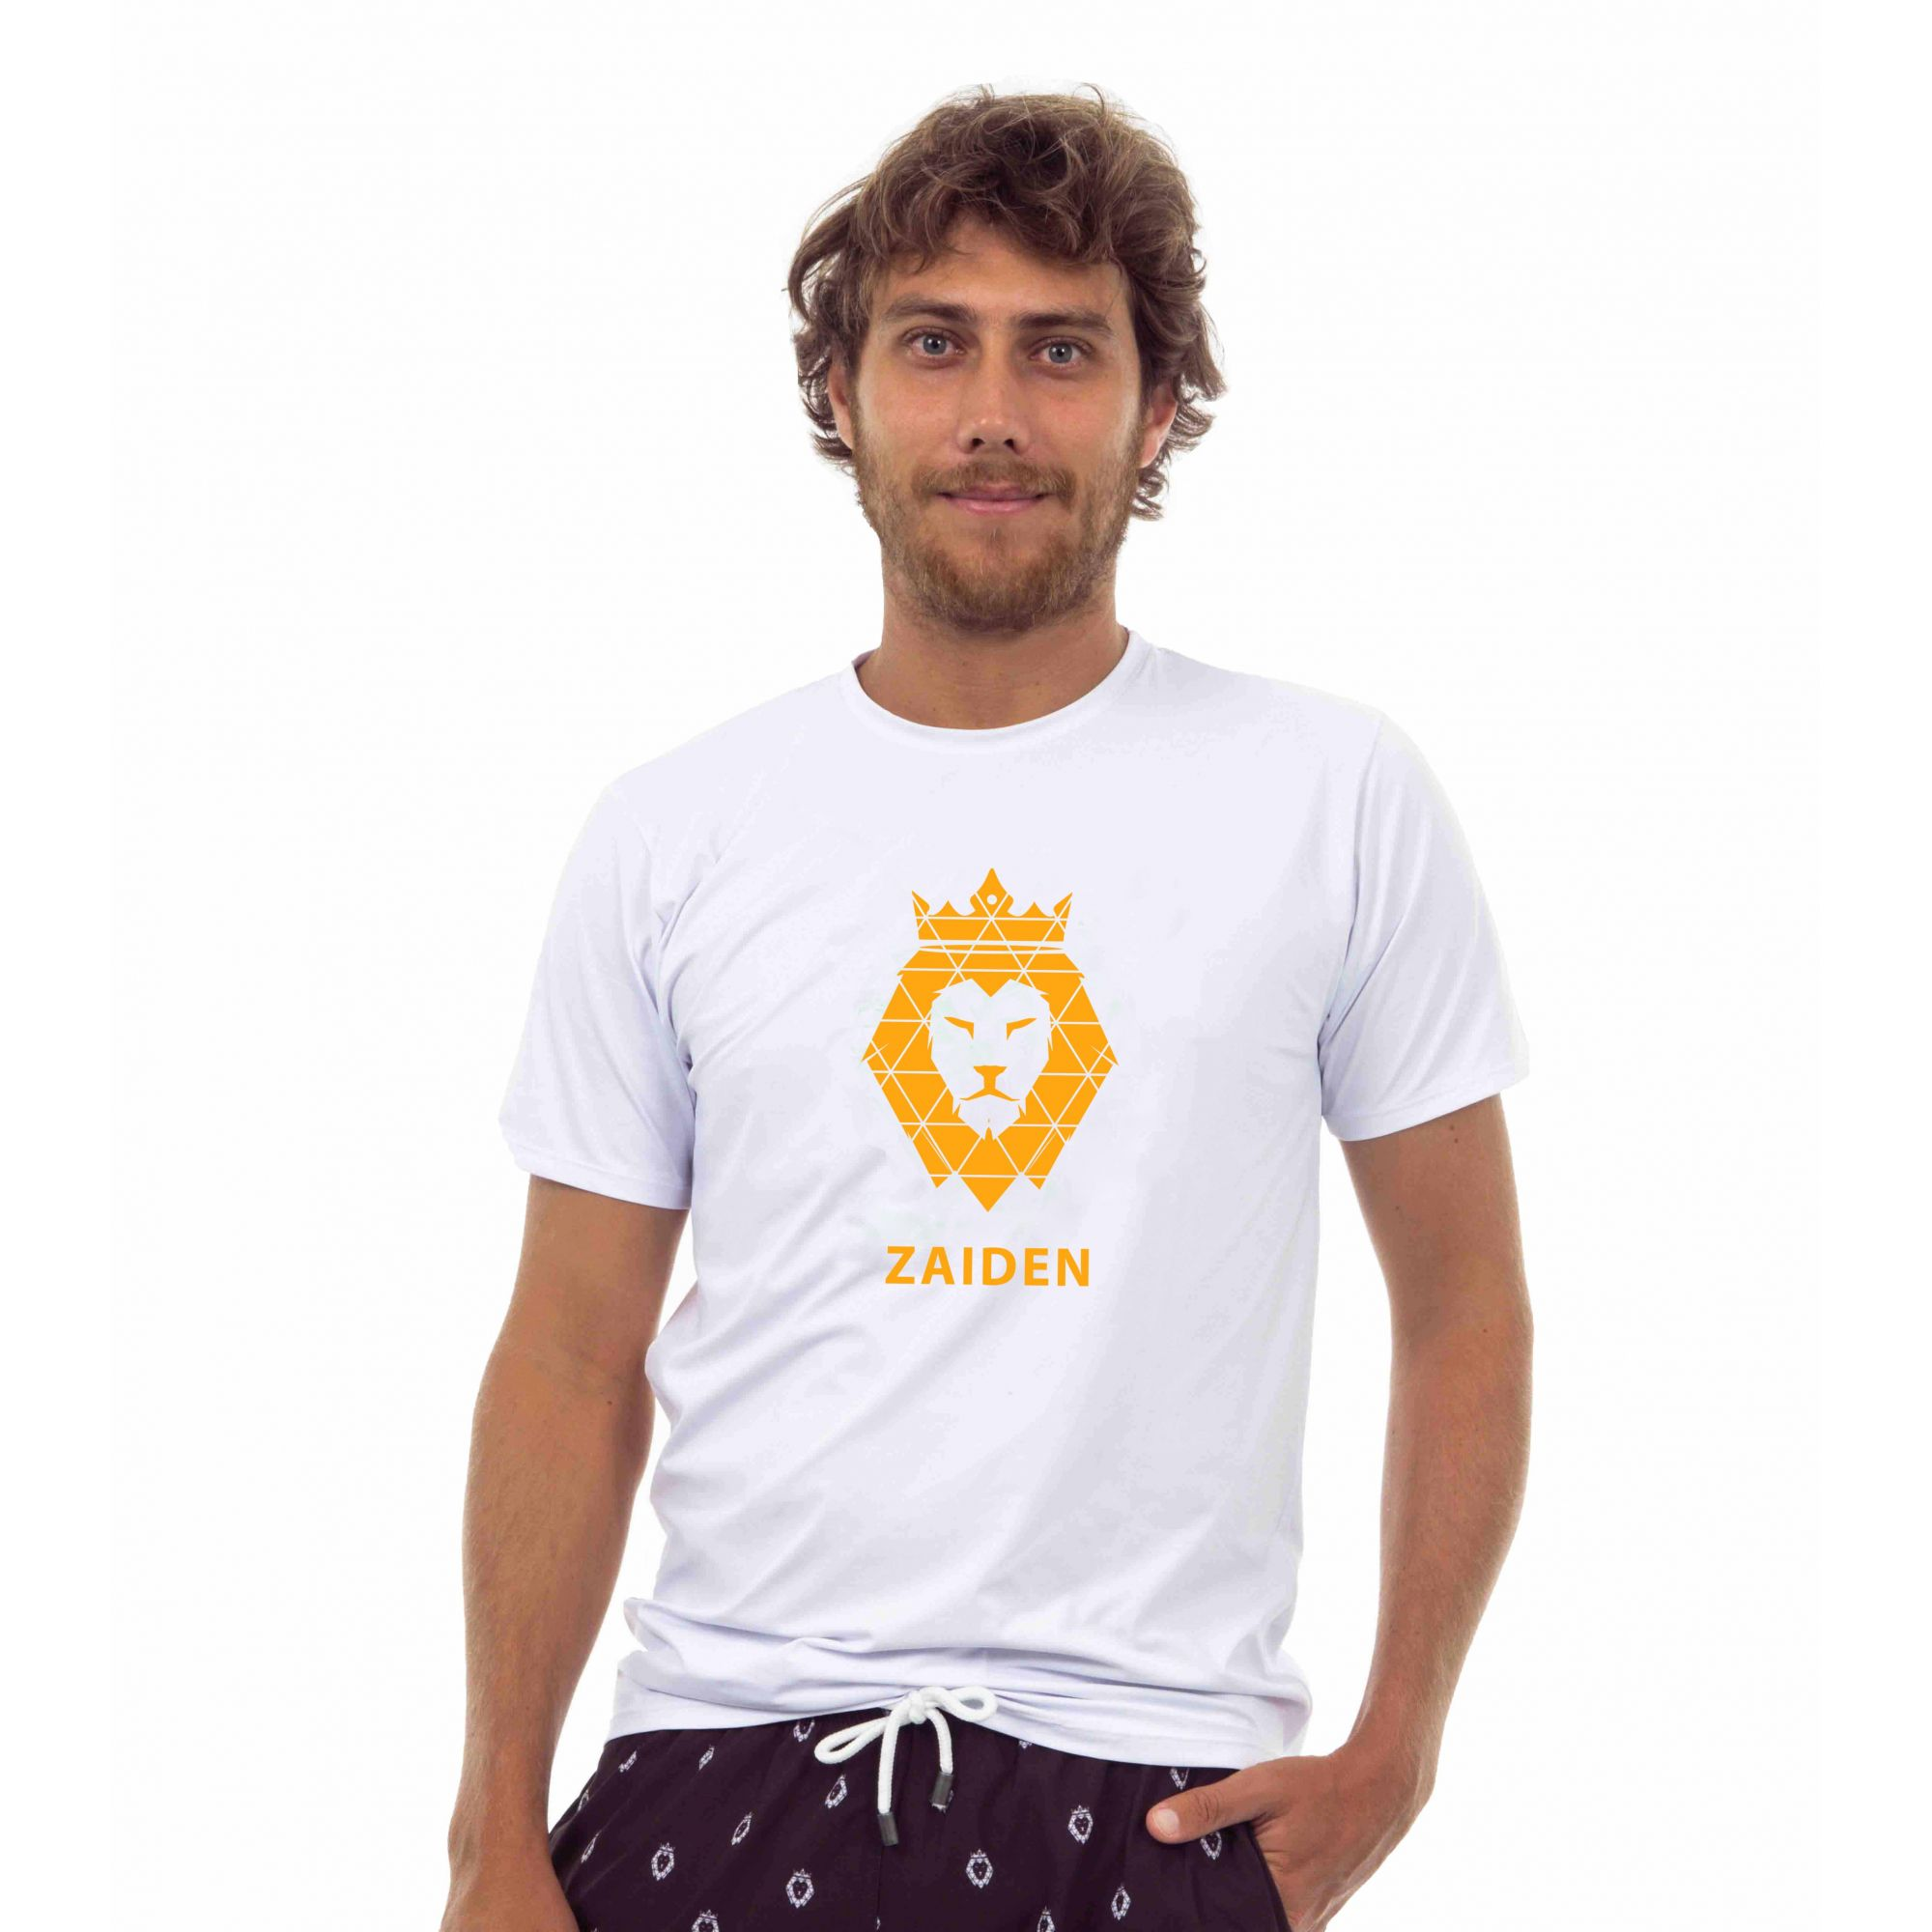 Camiseta Masculina Poliamida Zaiden Branca Leão Laranja